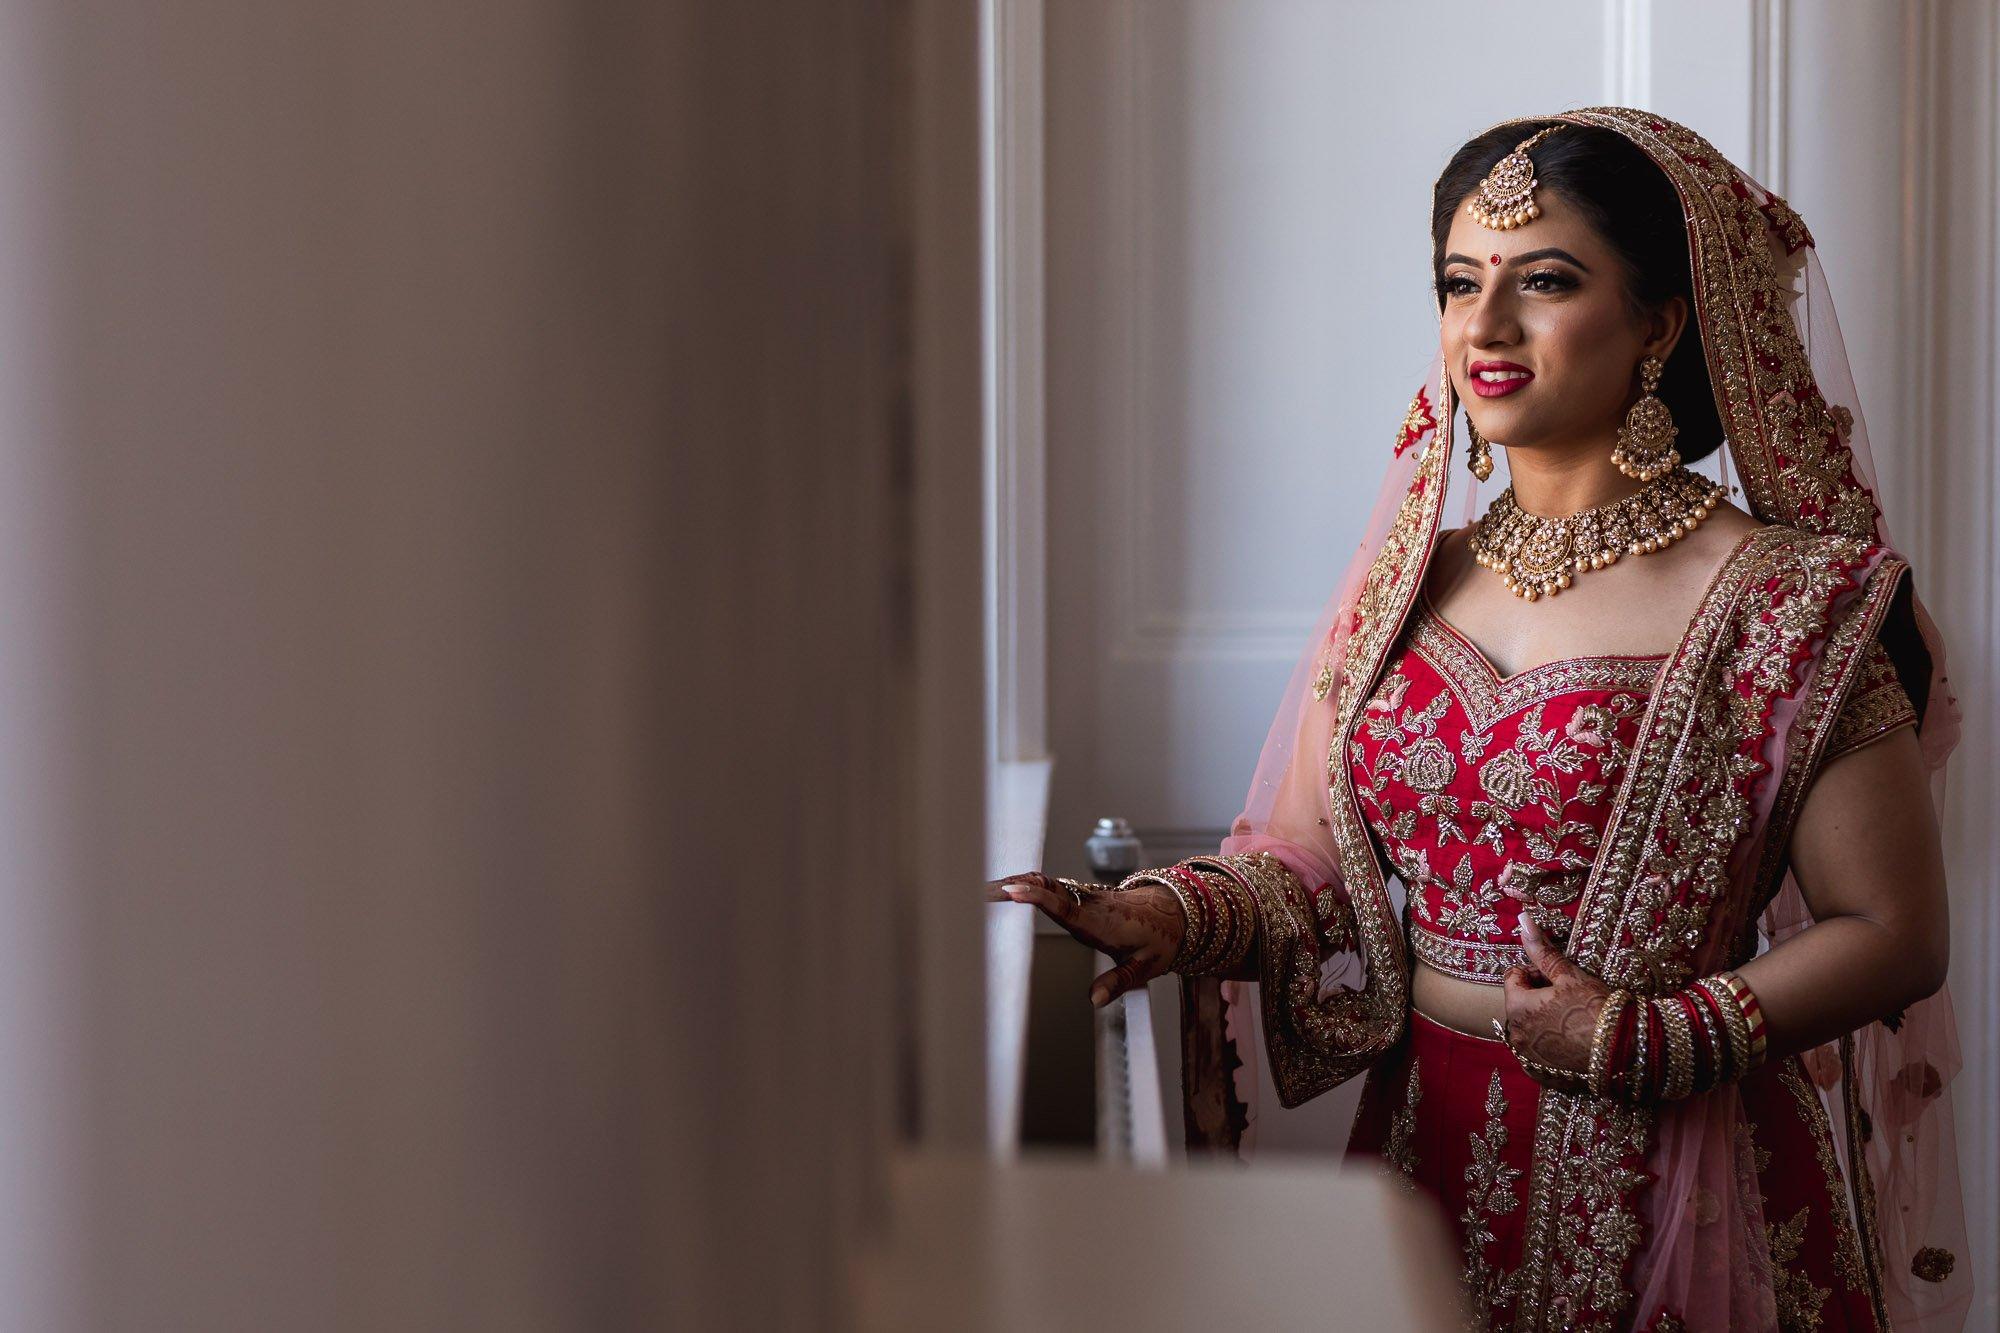 Dunchurch Park Hotel, Asian wedding photographer Midlands, bridal portrait